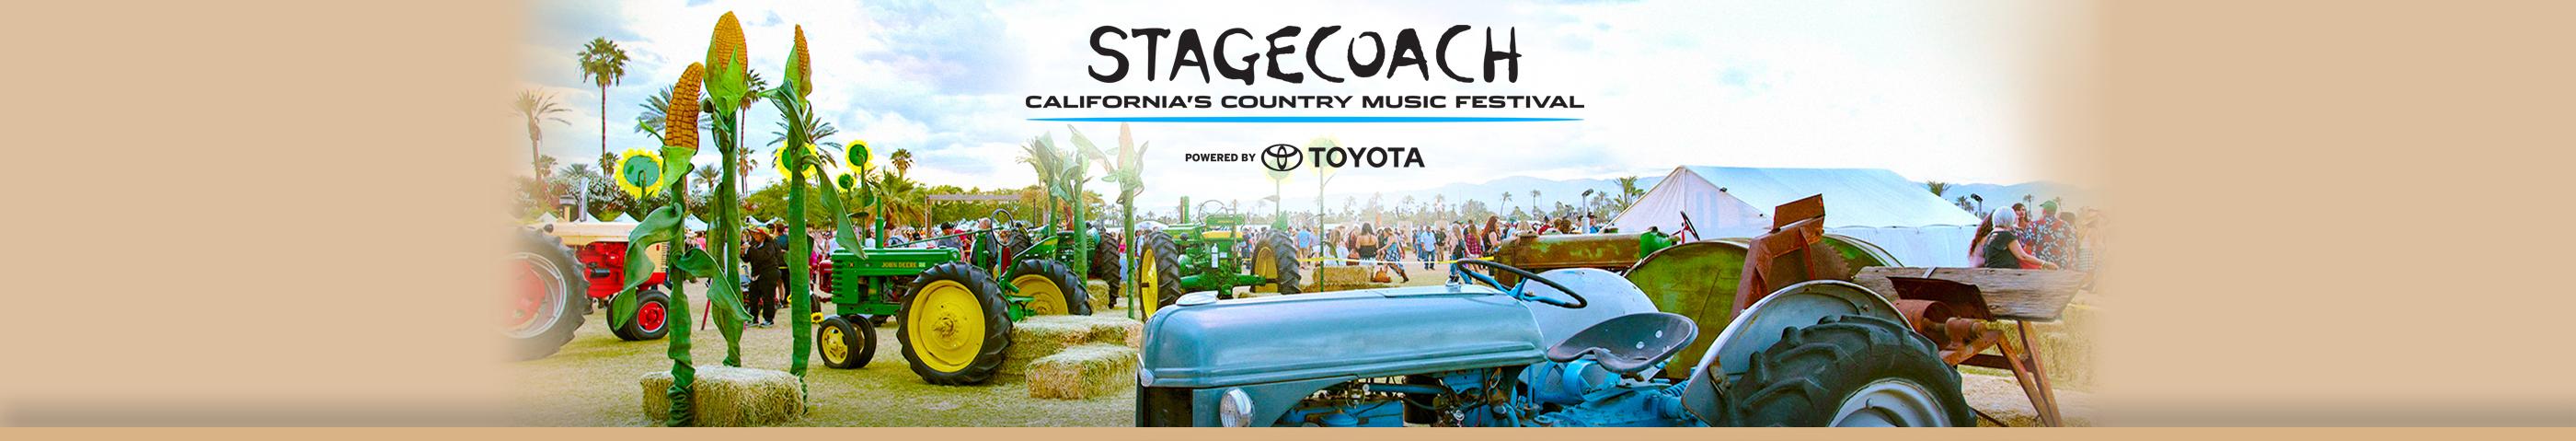 Stagecoach 2017